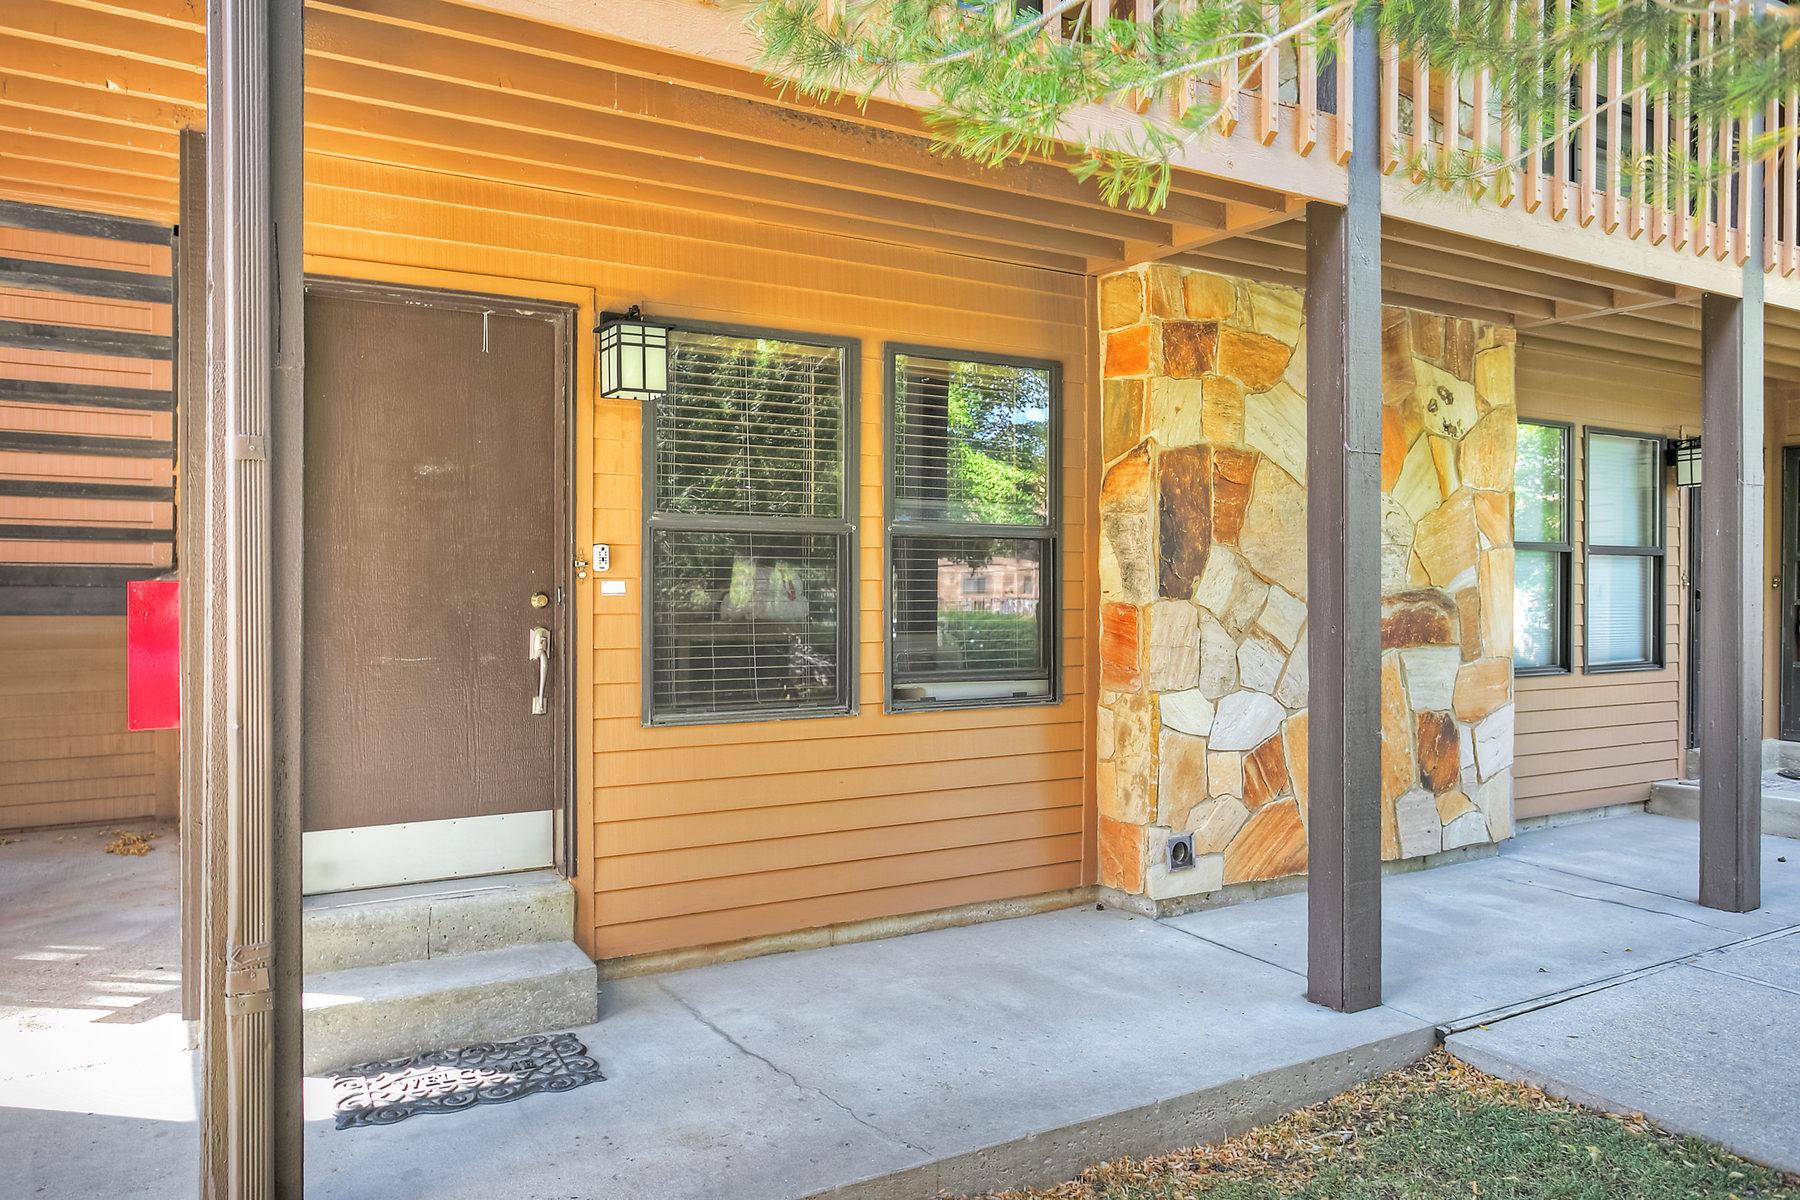 Condominium for Sale at Beautiful 4 Season Resort Area 3615 N Wolf Lodge Dr #1306 Eden, Utah 84310 United States